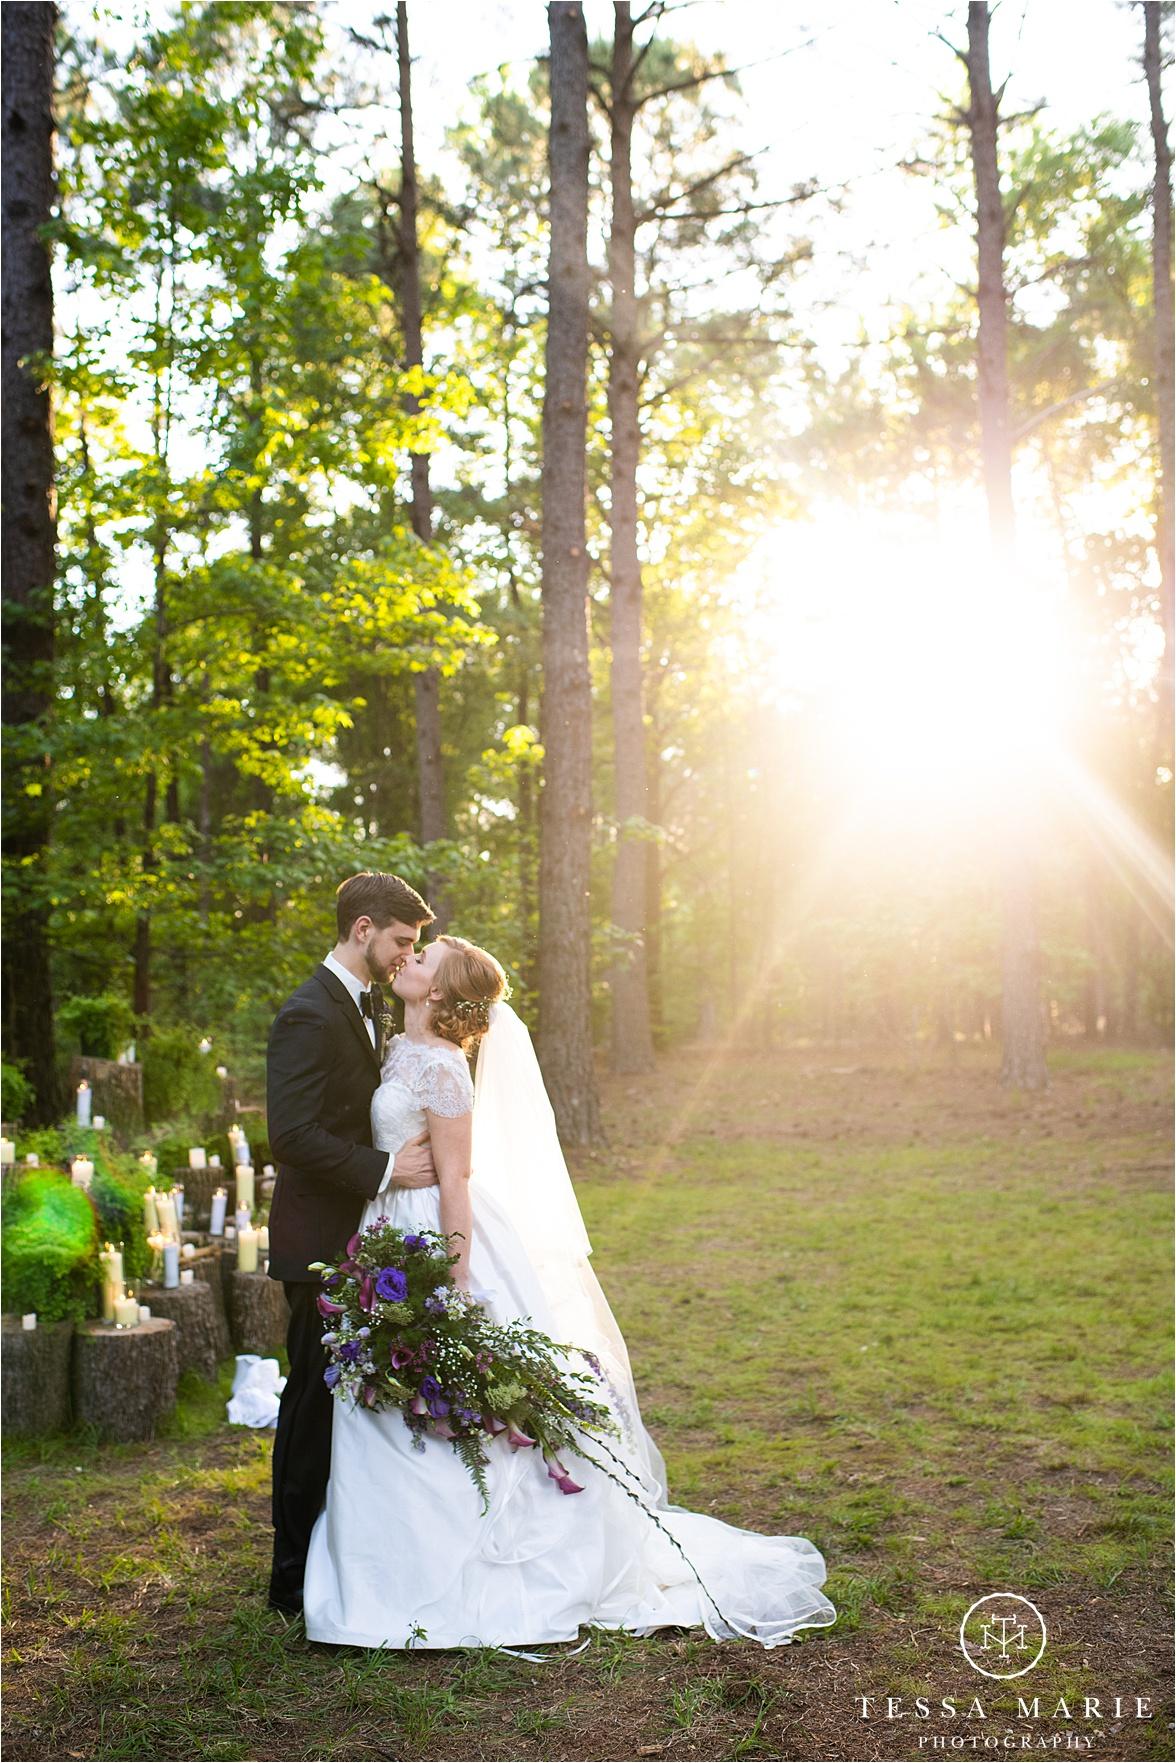 Tessa_marie_weddings_columbus_wedding_photographer_wedding_day_spring_outdoor_wedding_0122.jpg